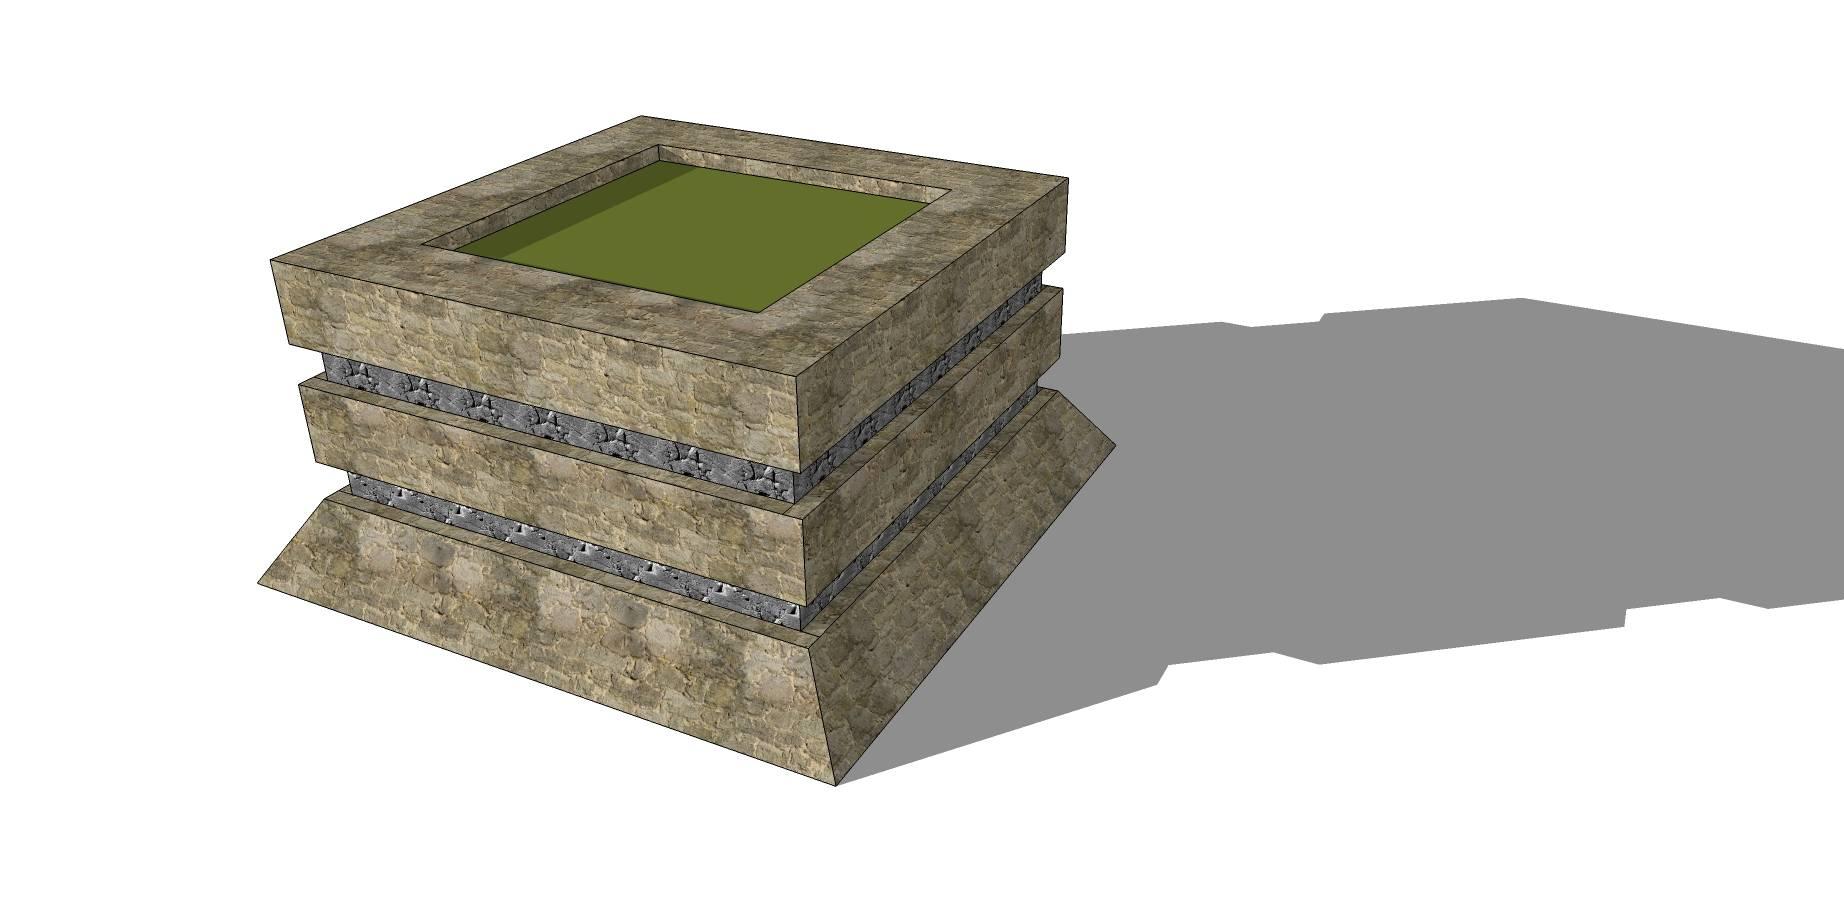 矩形石质种植池sketchup模型素材